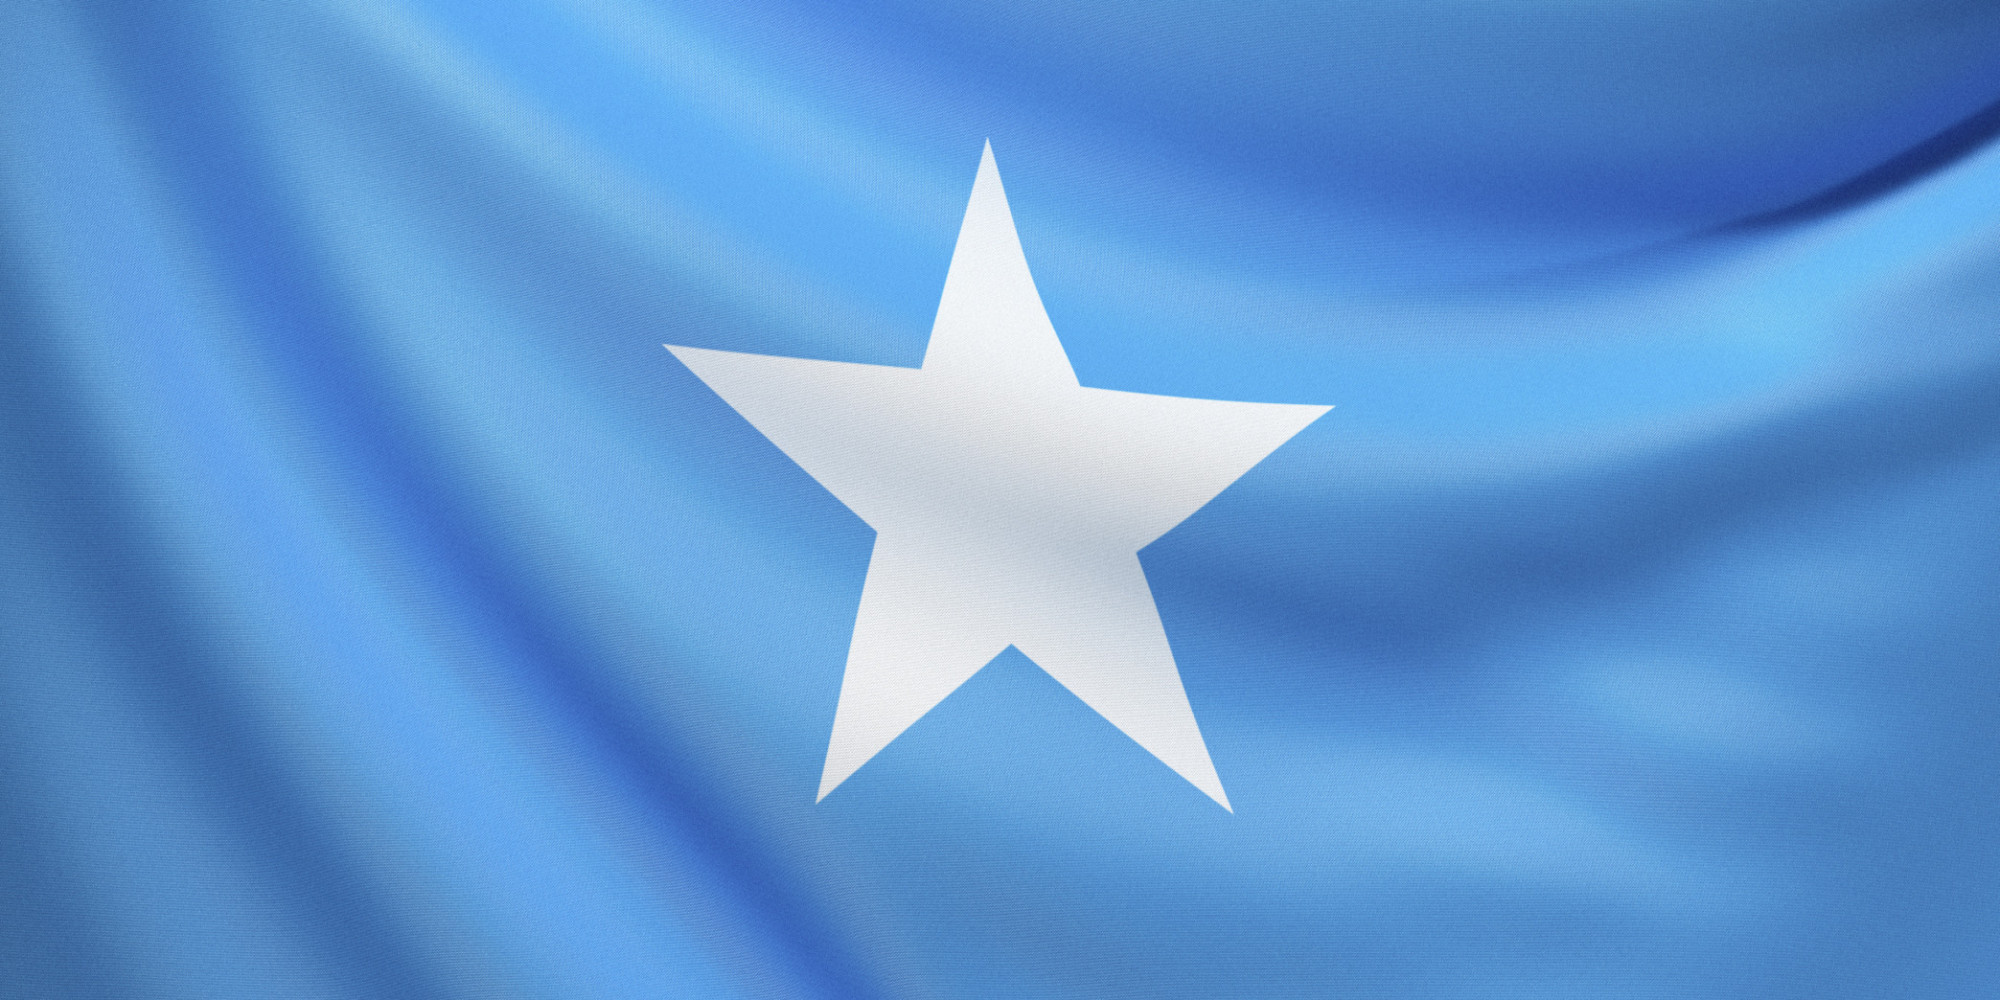 Image Somalia Flag Download